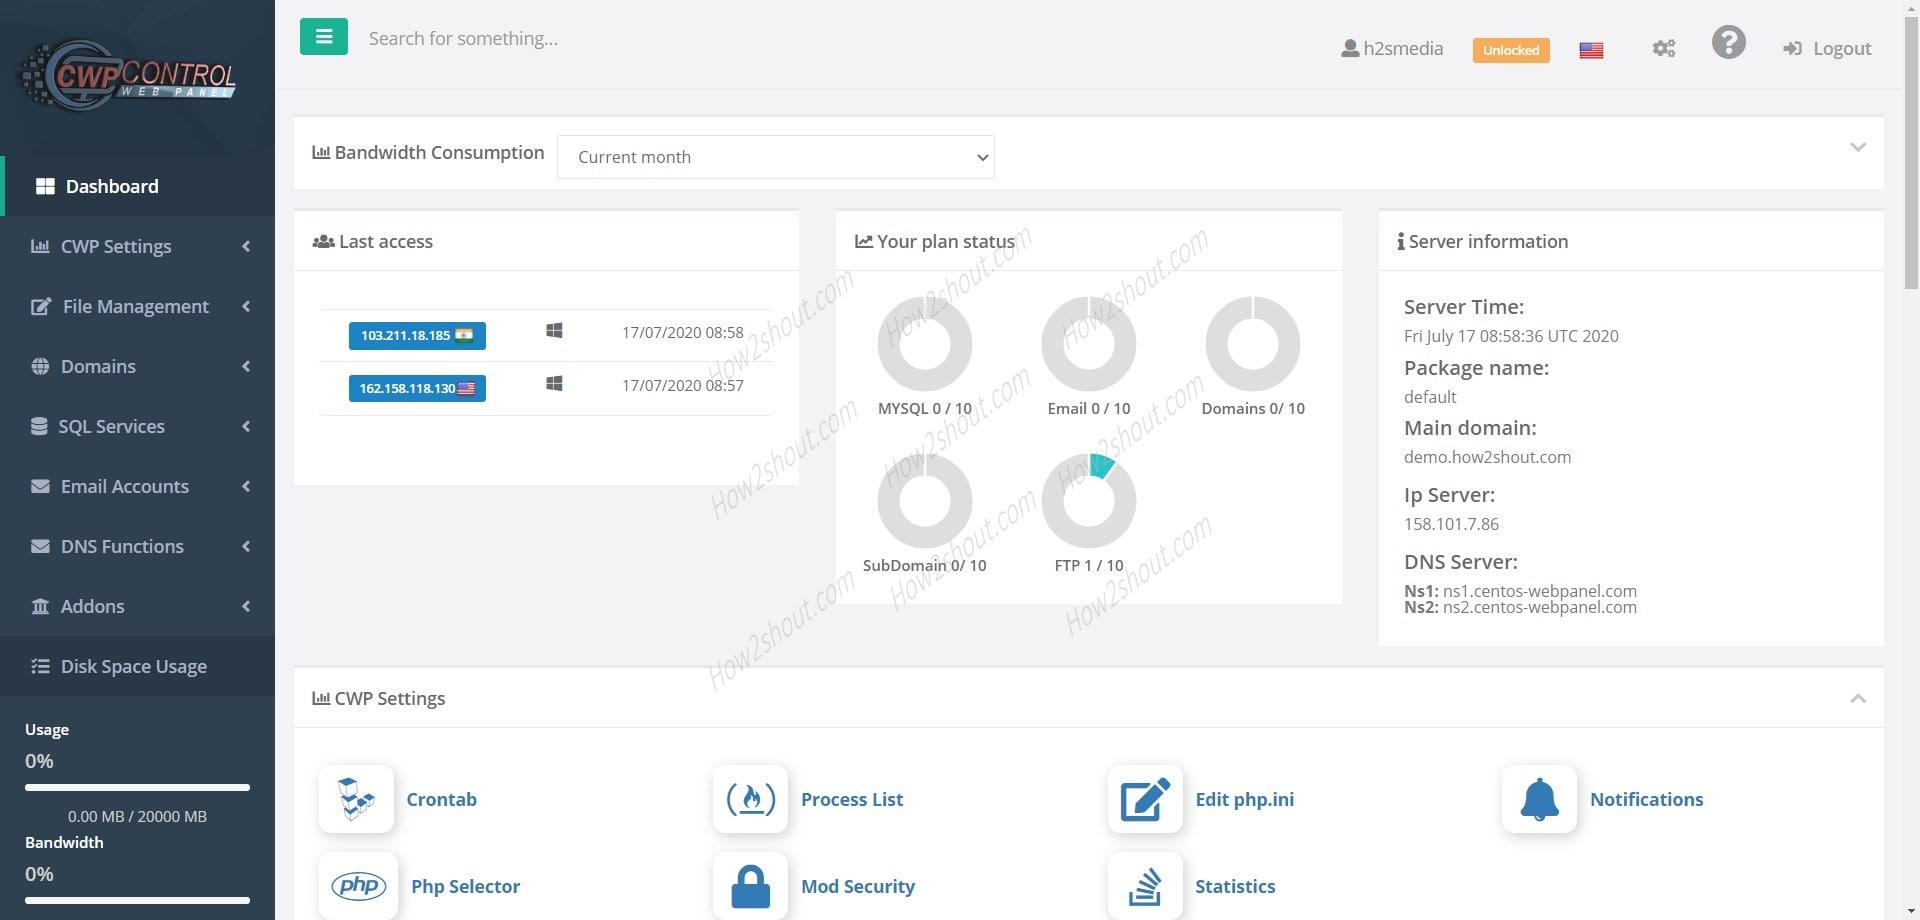 CWP Control Webpanel screenshot